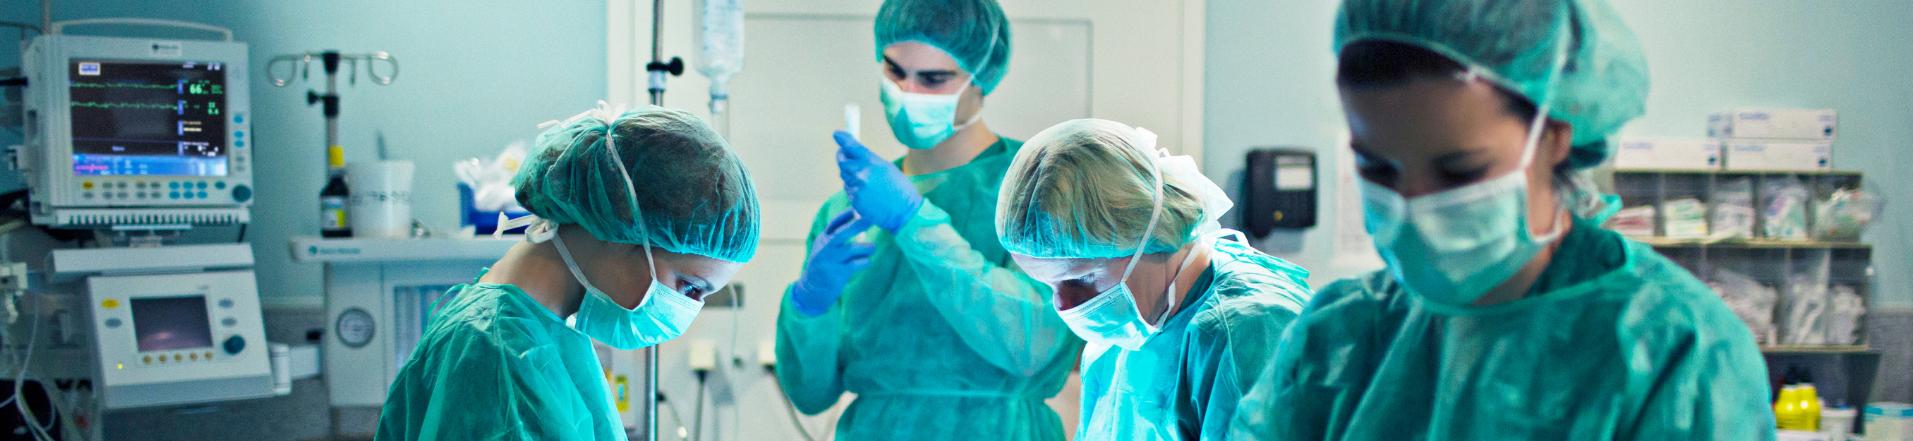 School of Medicine and Surgery